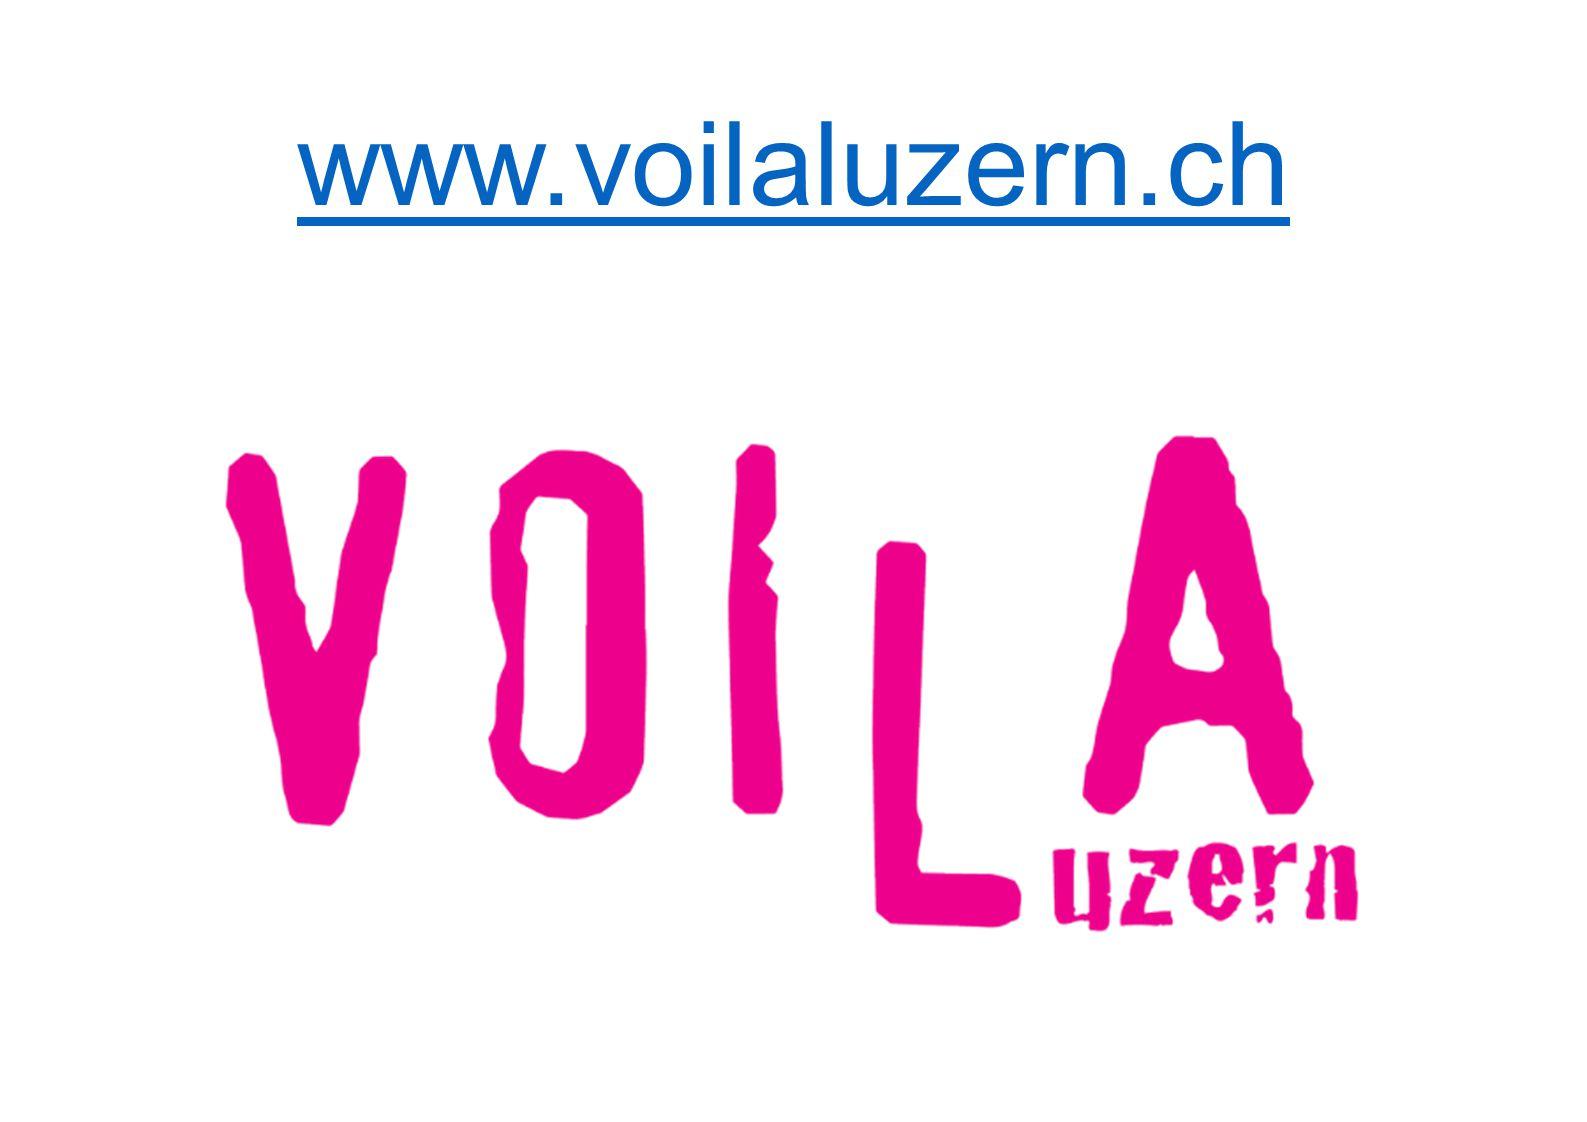 www.voilaluzern.ch